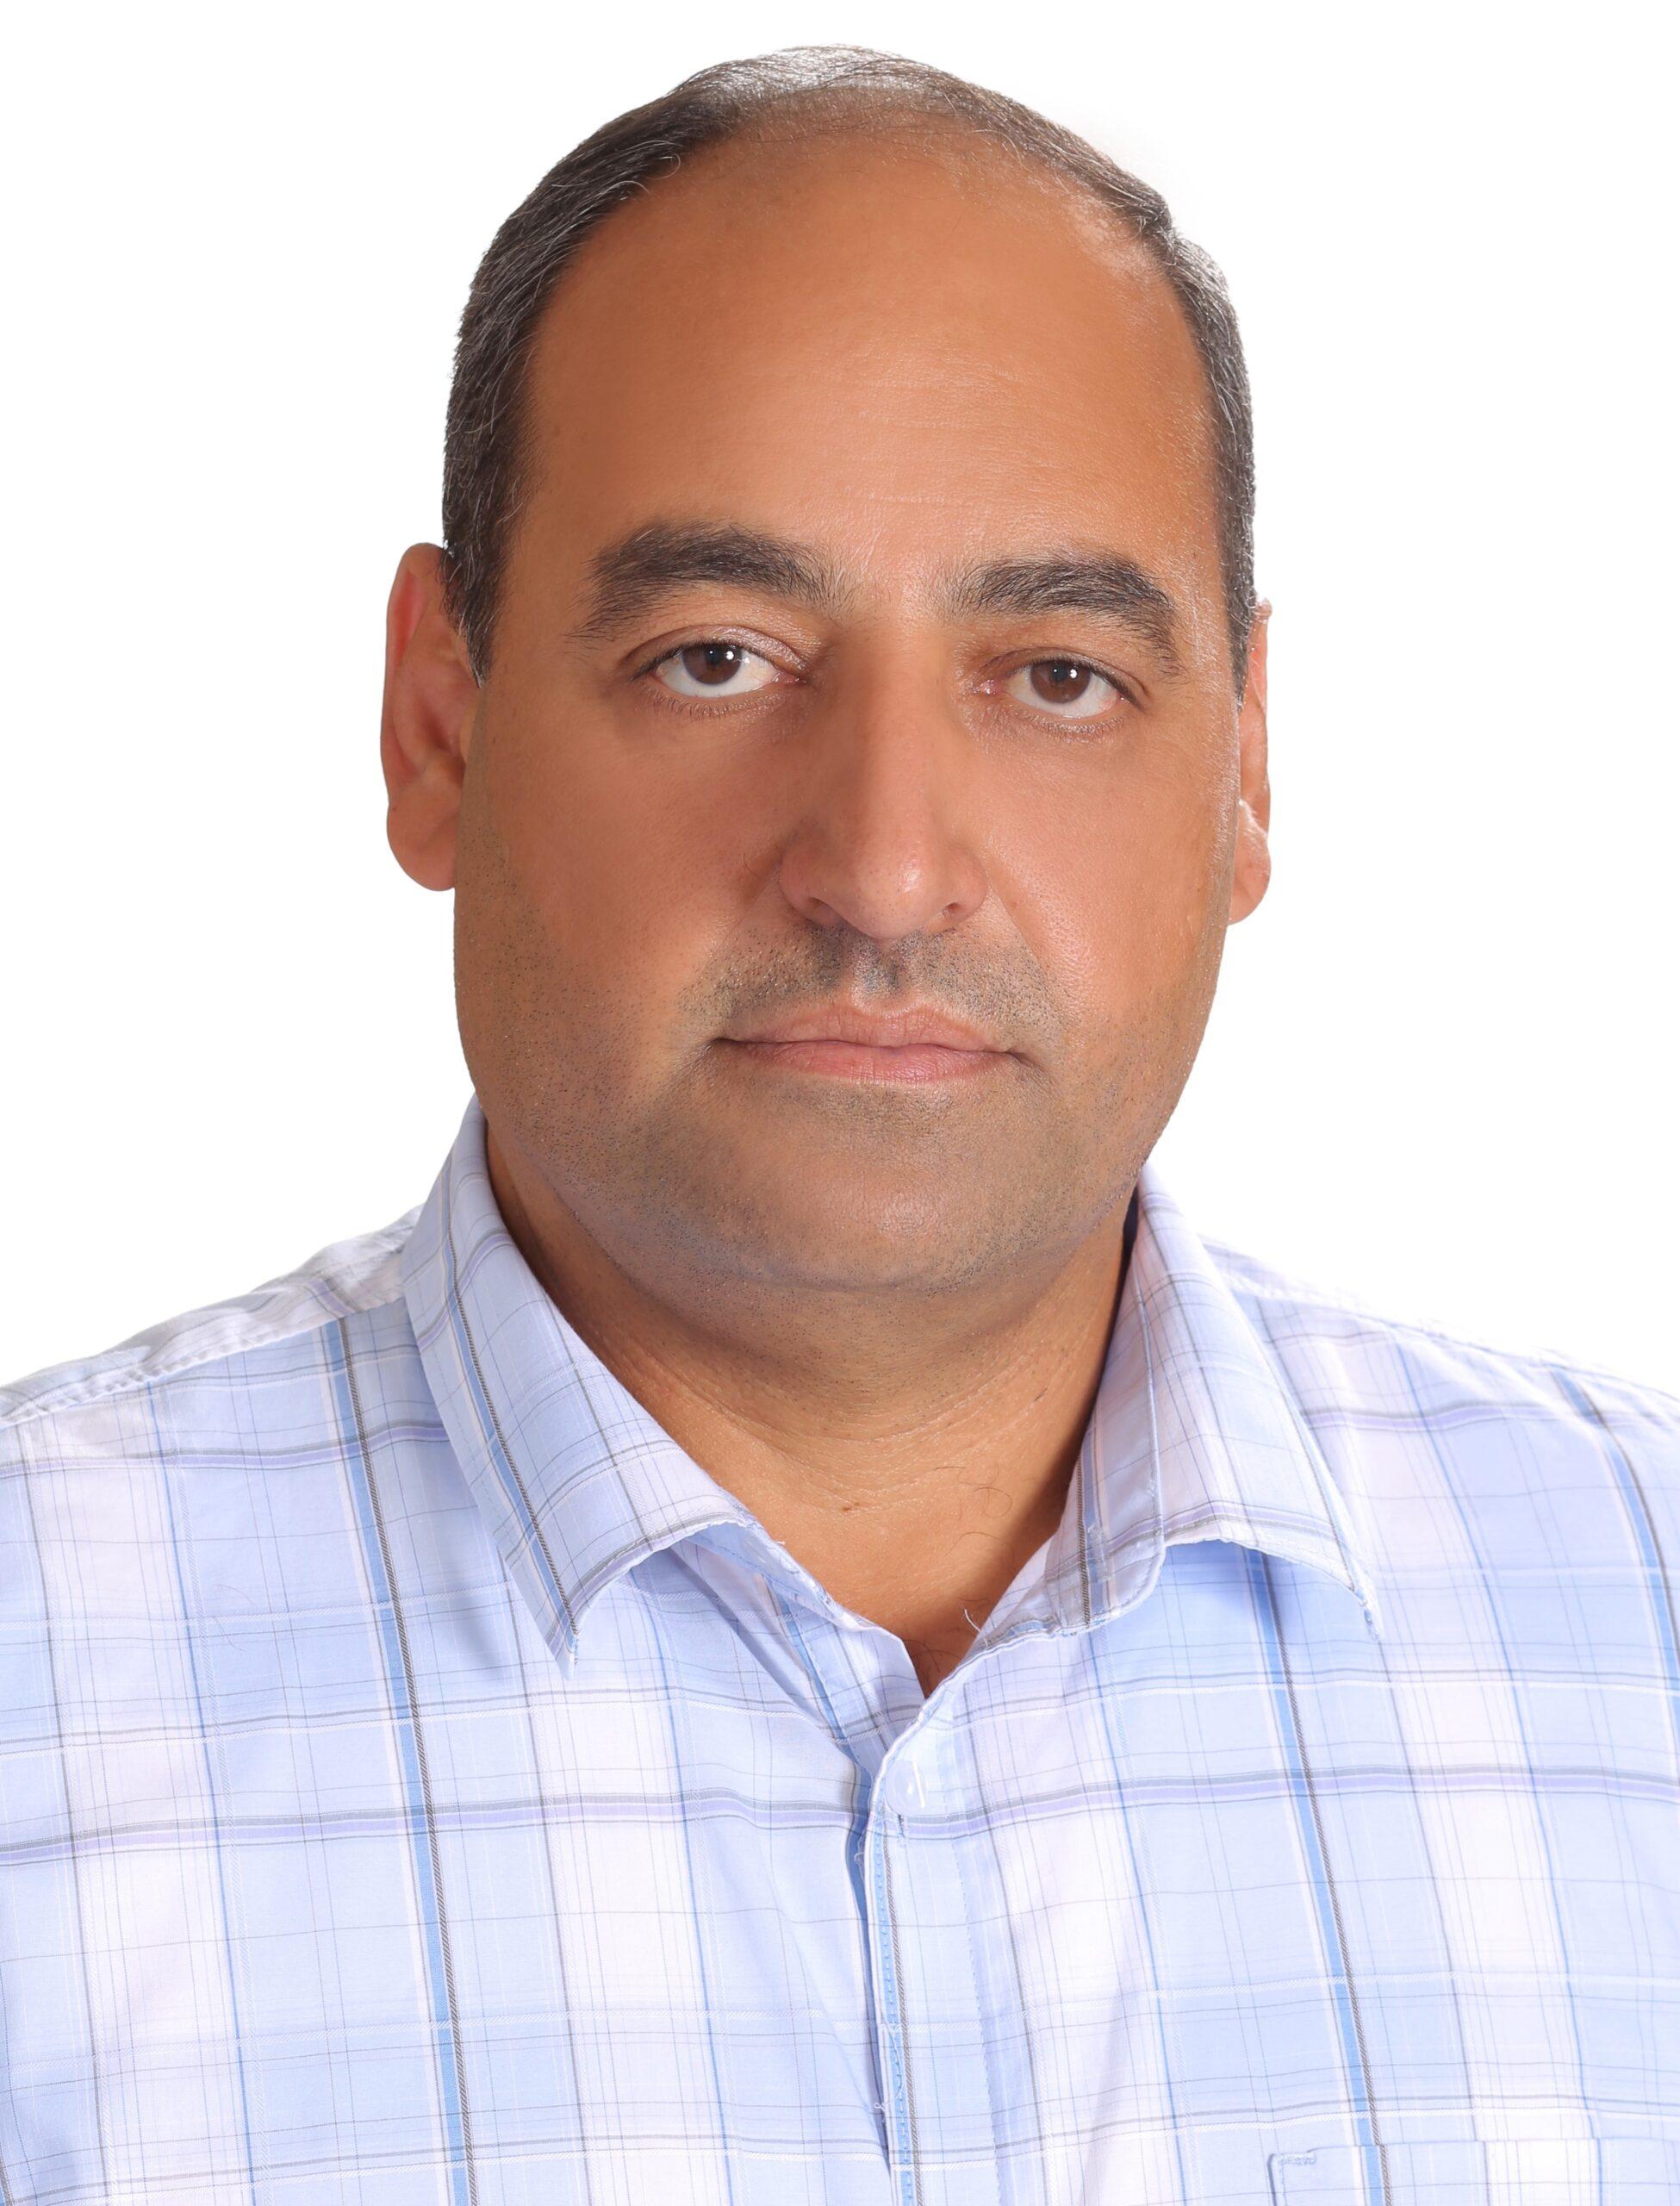 Headshot of Khalid Abdel Hafeez.